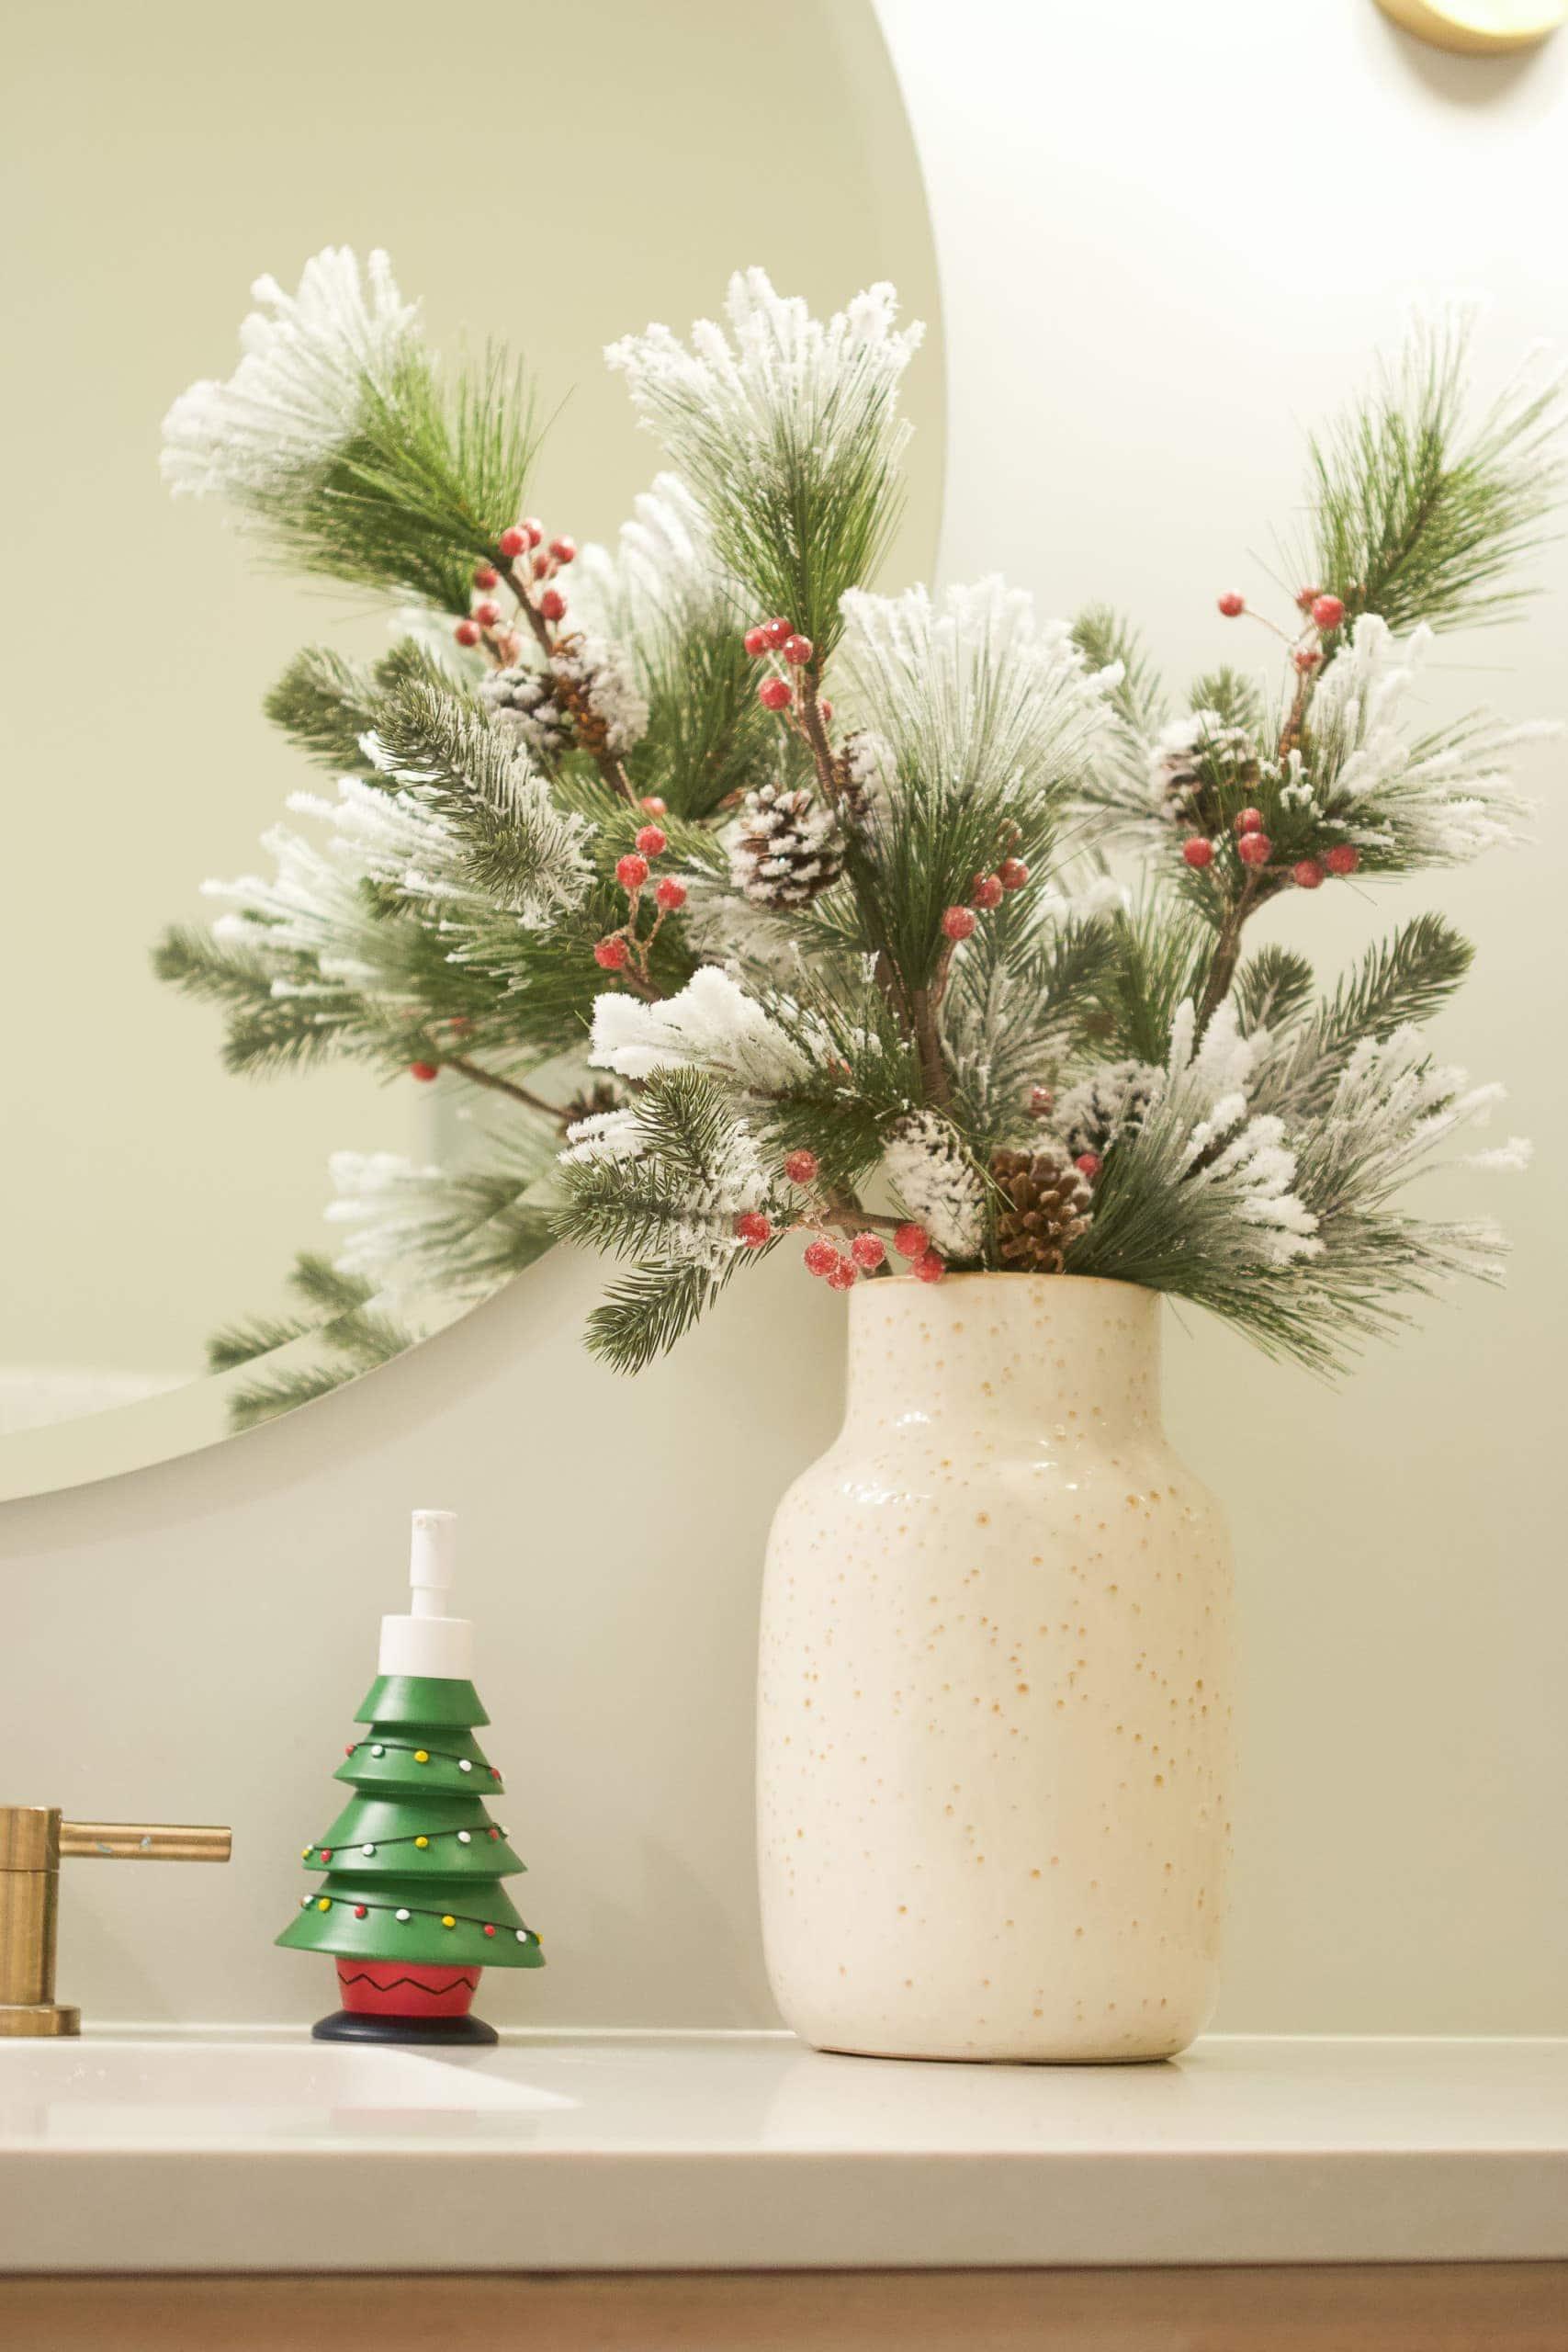 Adding Christmas cheer to your home